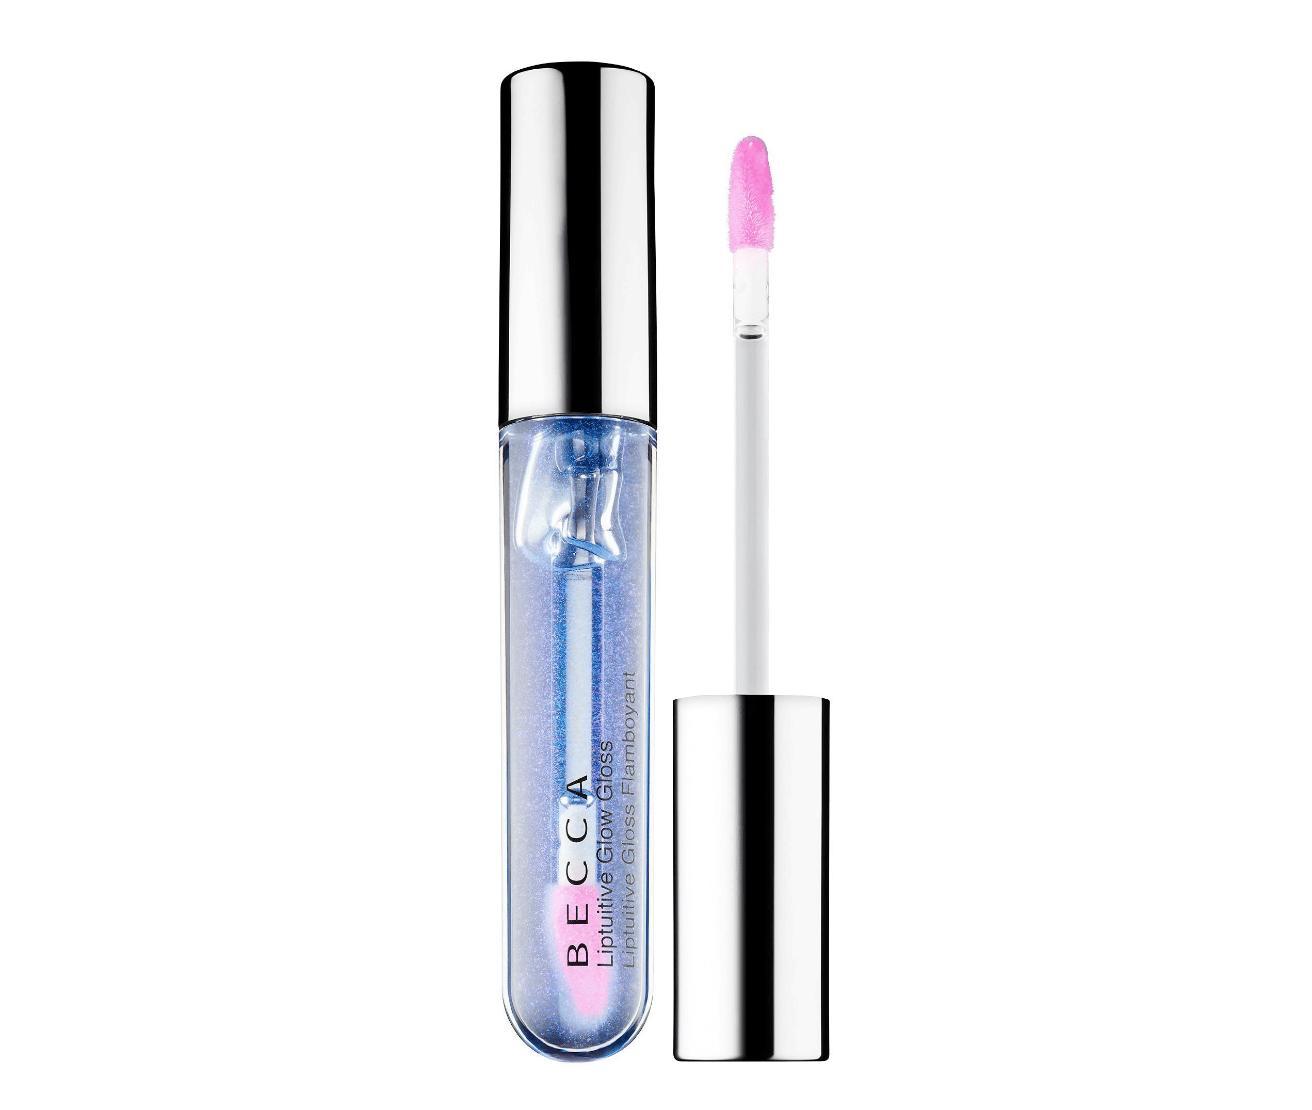 BECCA Liptuitive Glow Lip Gloss